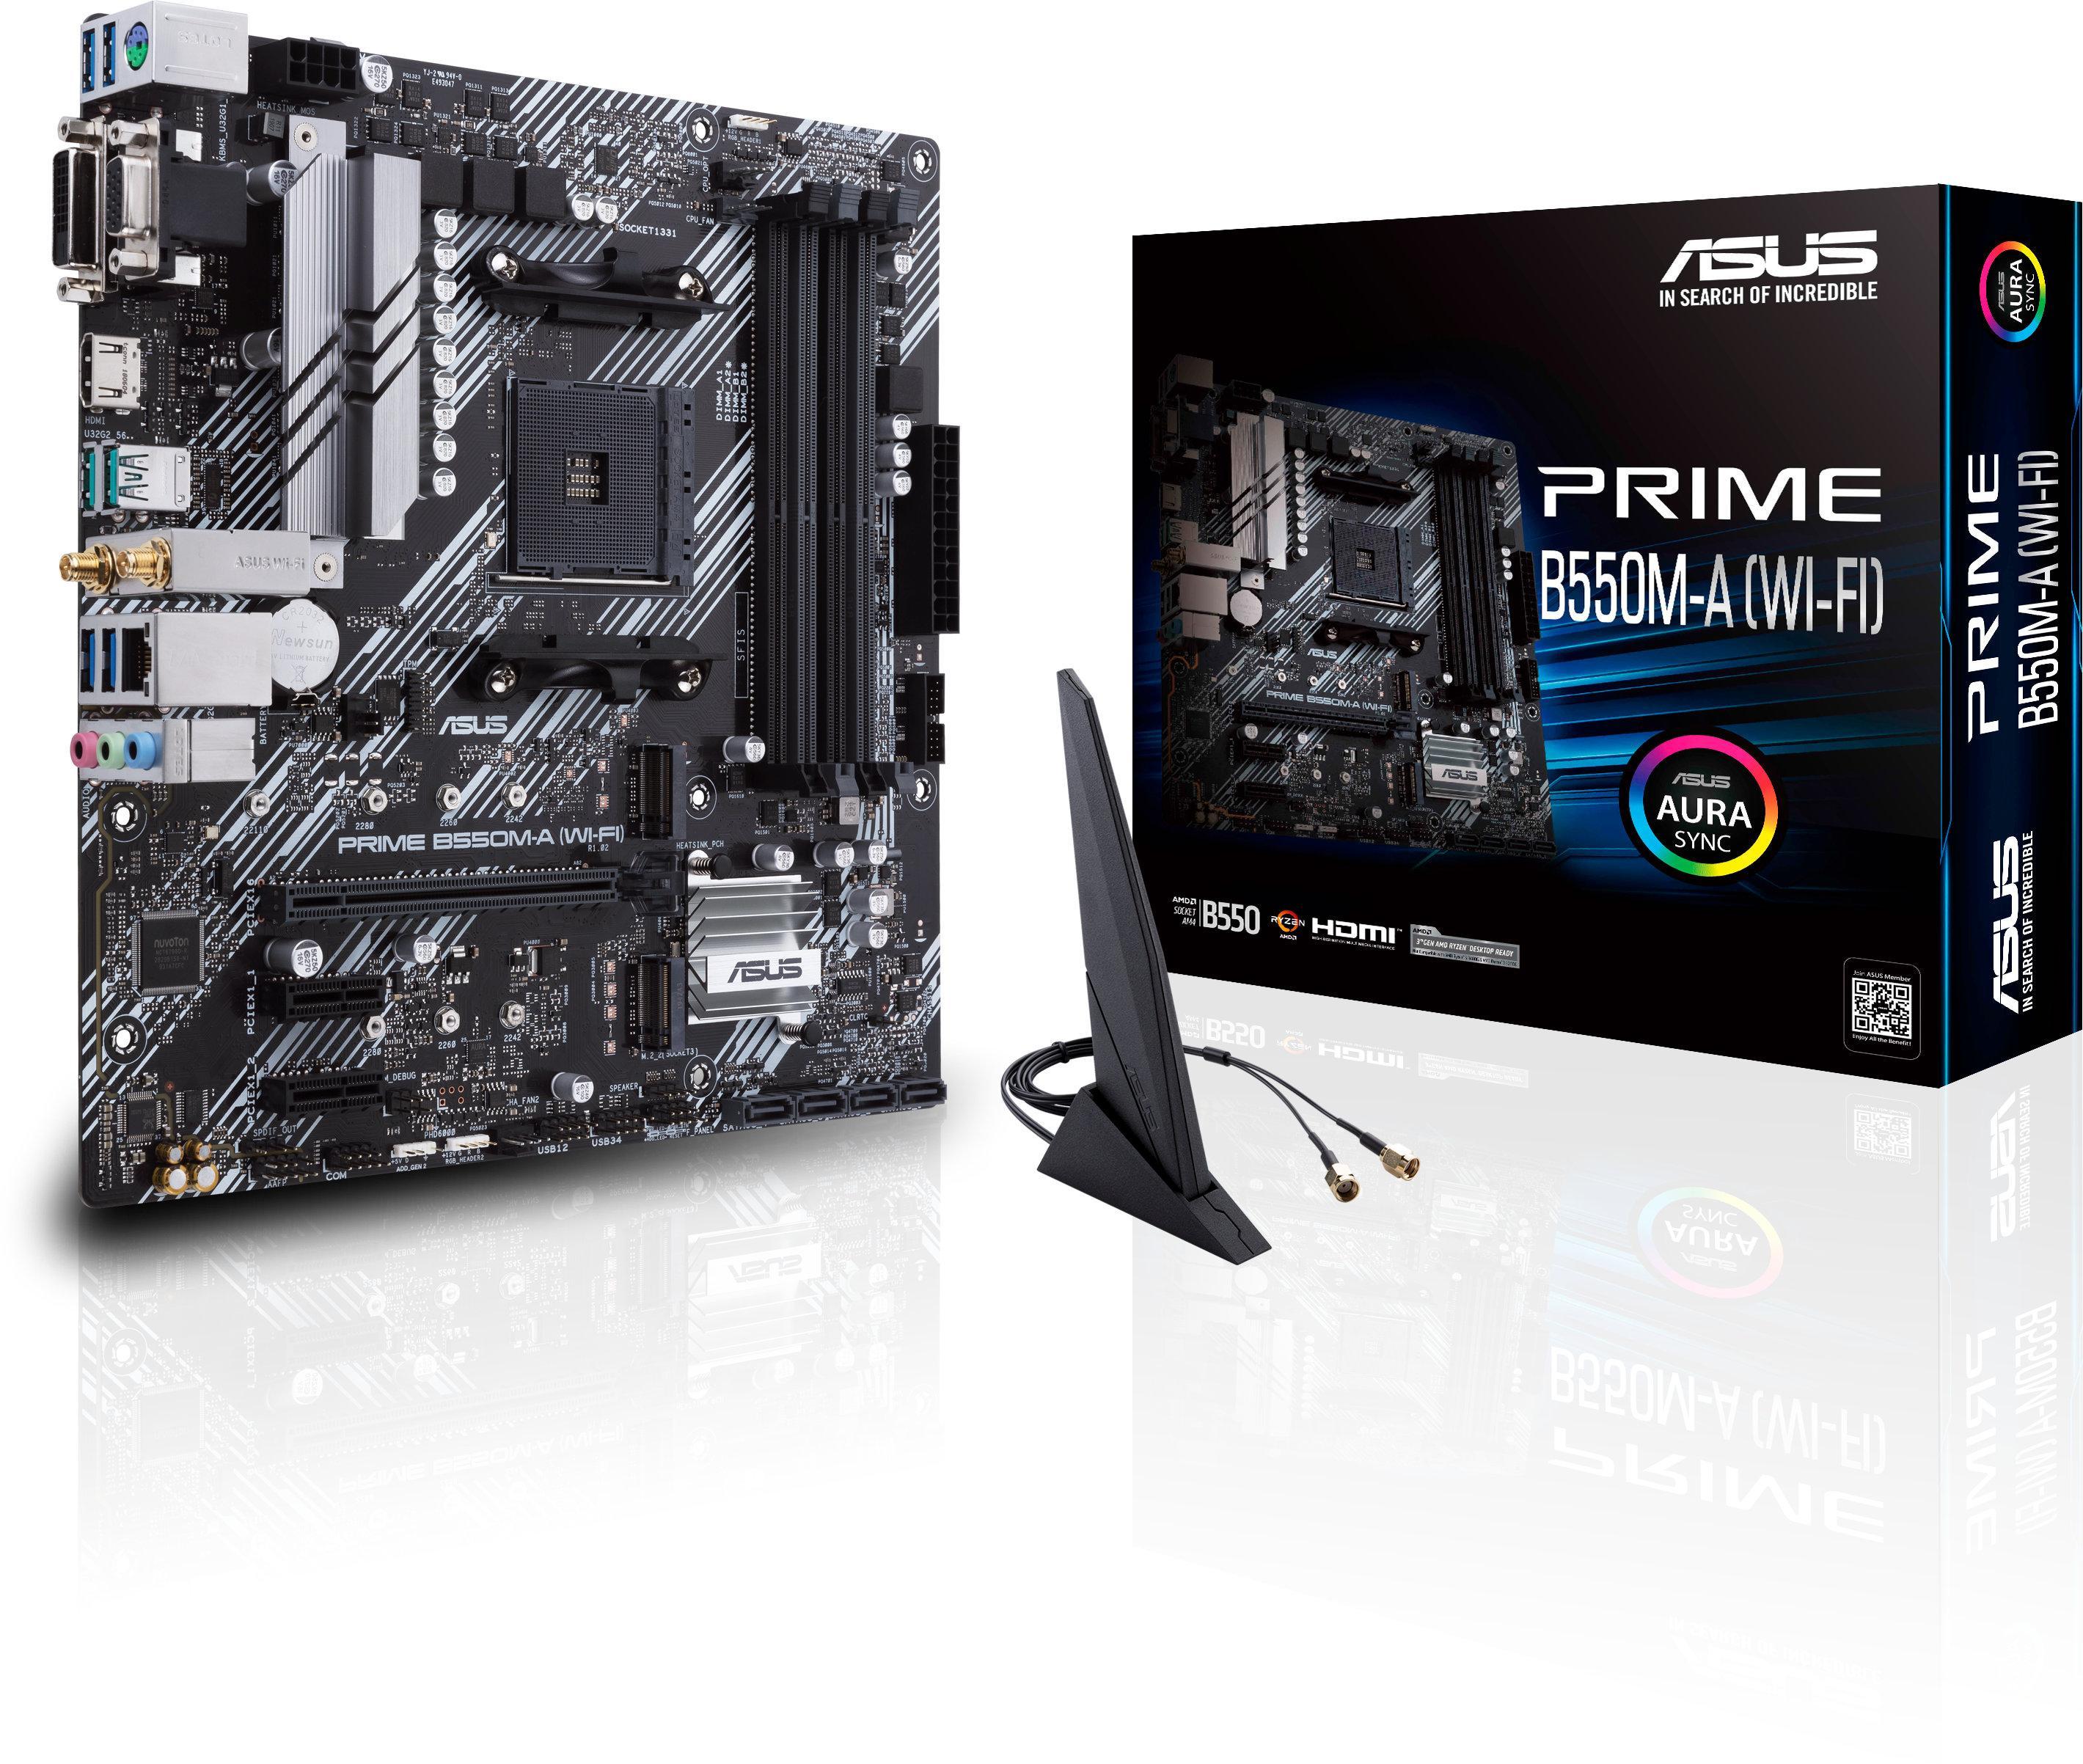 Дънна платка ASUS Prime B550M-A (WI-FI) socket AM4, 4xDDR4, Aura Sync, PCIe 4.0, Dual M.2, WiFi 6-2